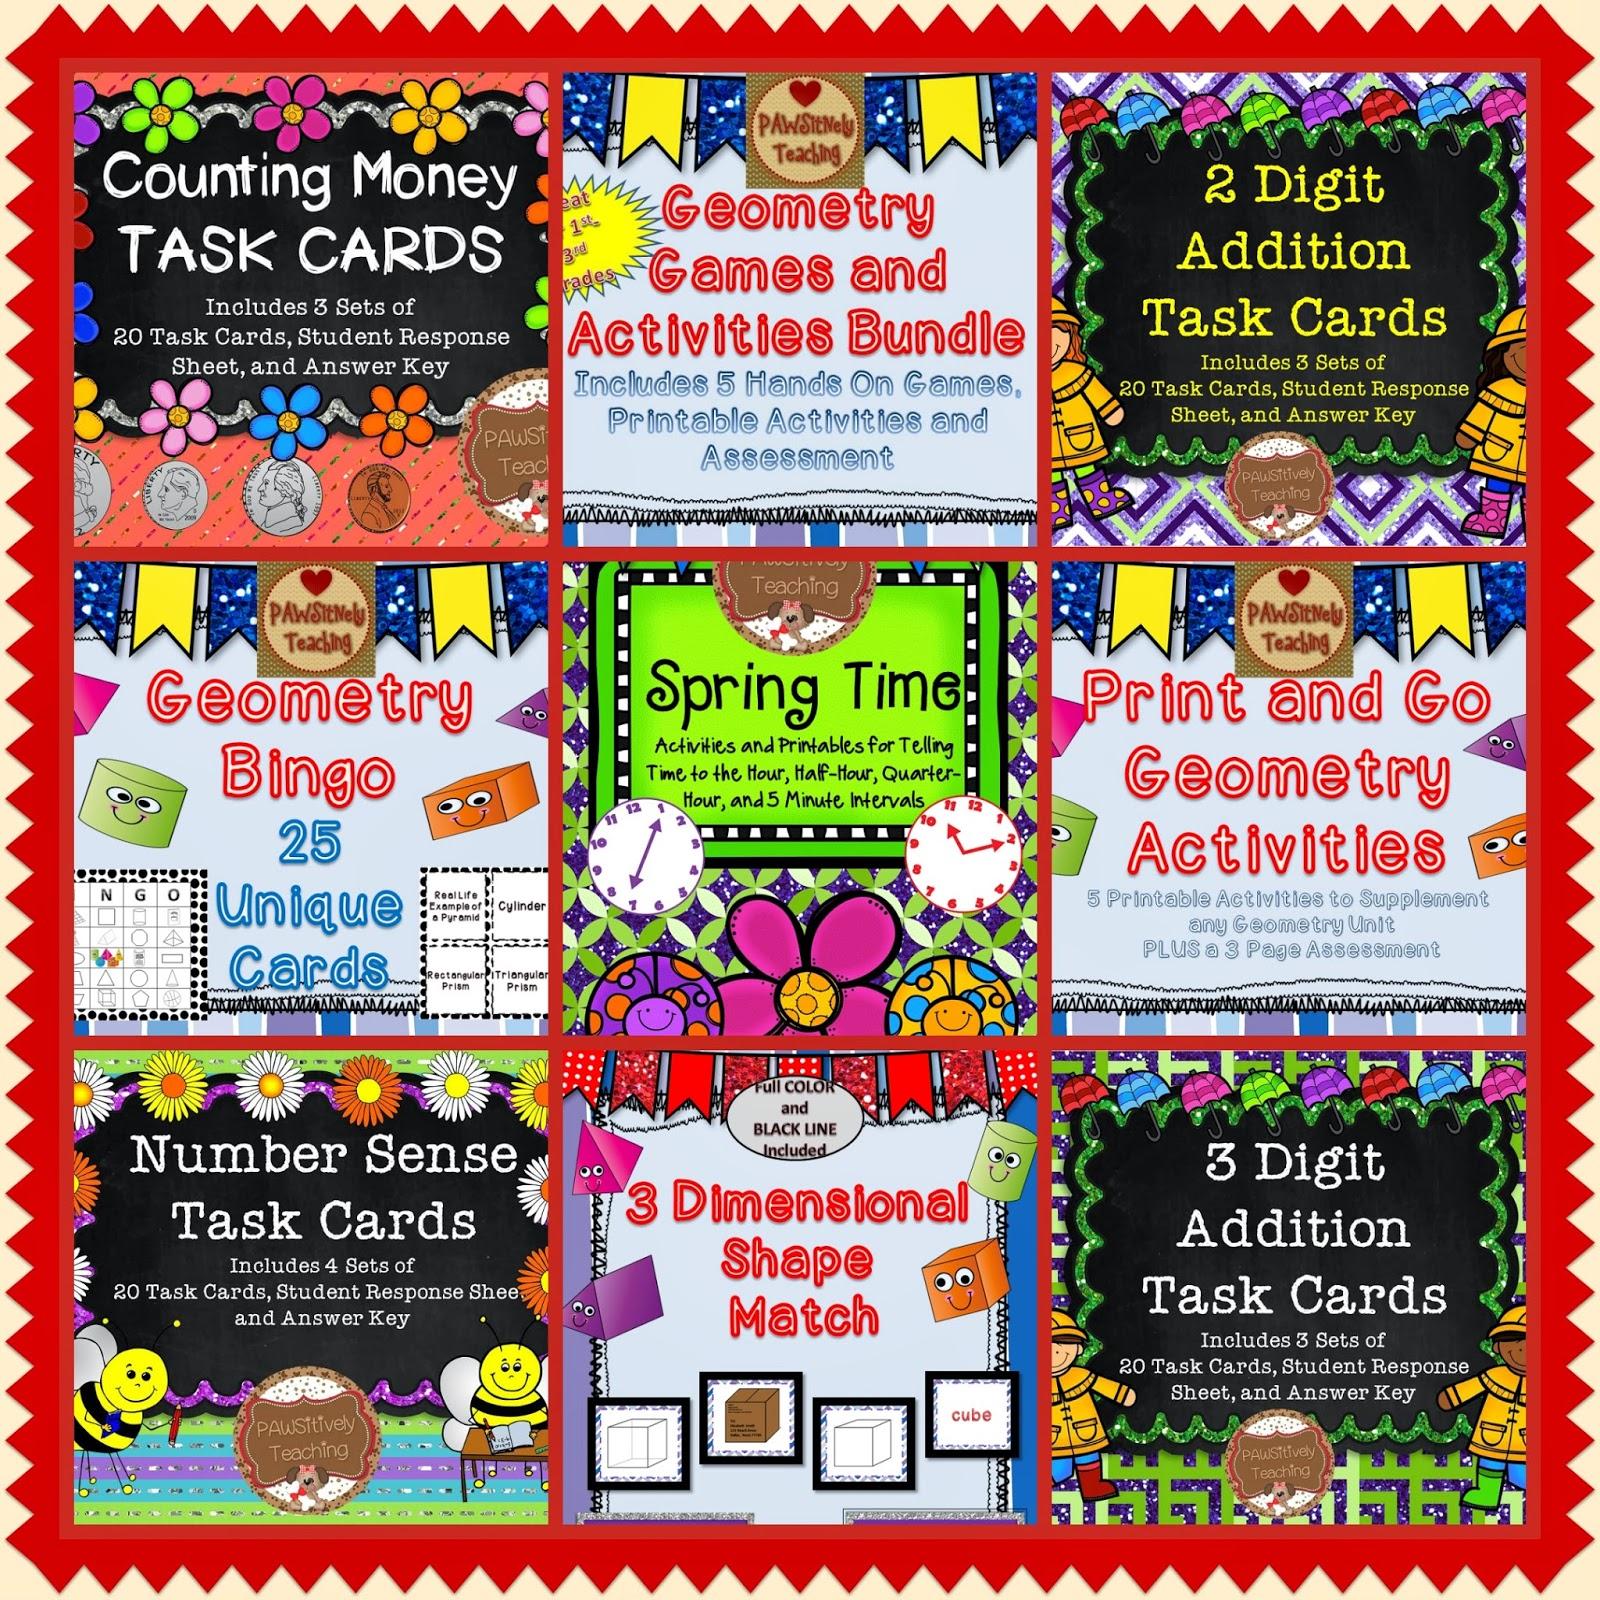 http://www.teacherspayteachers.com/Store/Pawsitively-Teaching